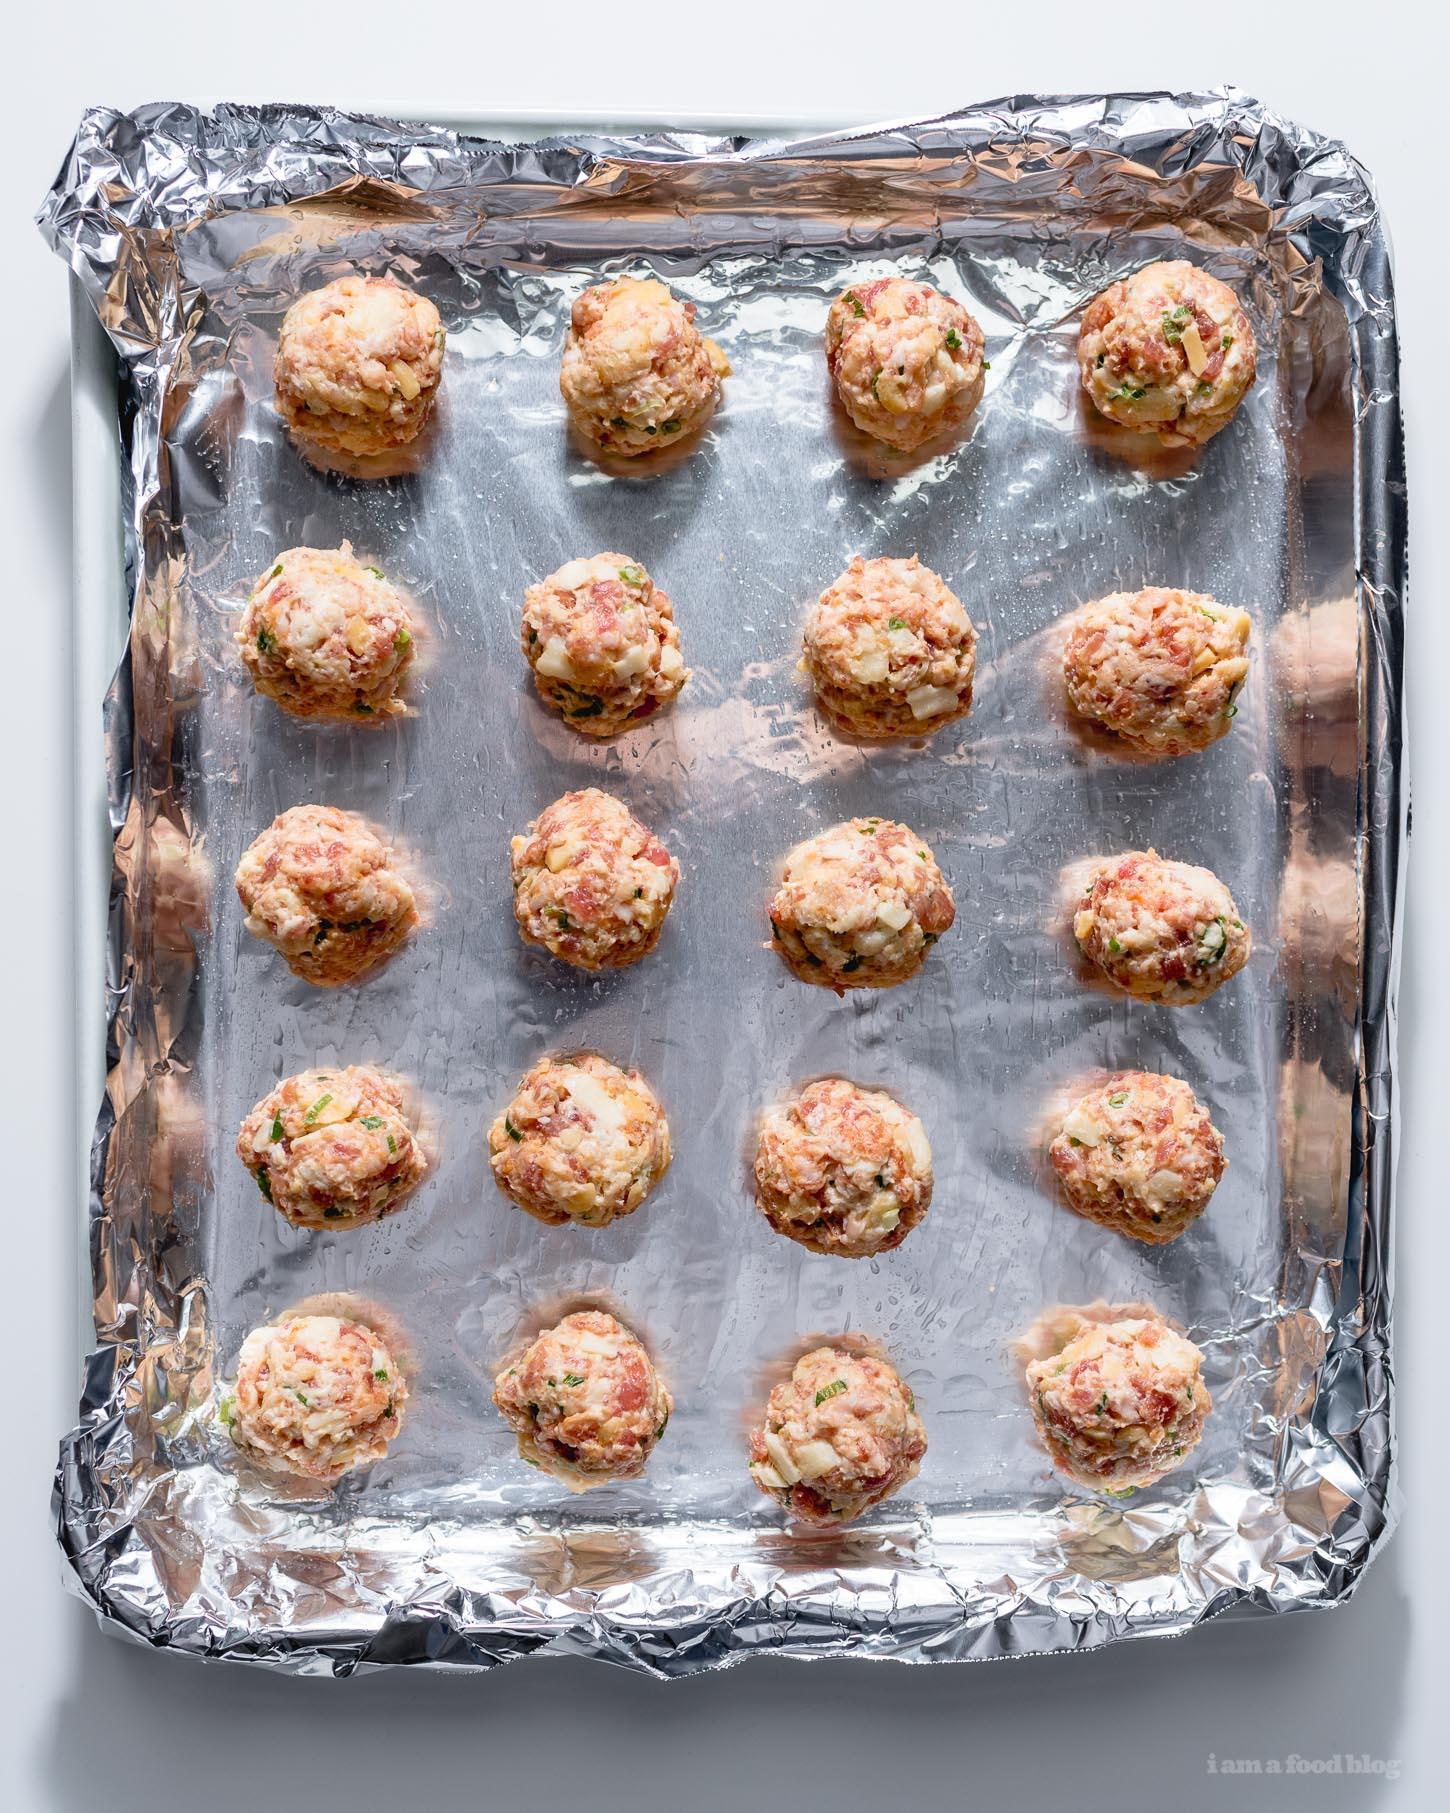 Sausage Cheese Balls Recipe | www.iamafoodblog.com